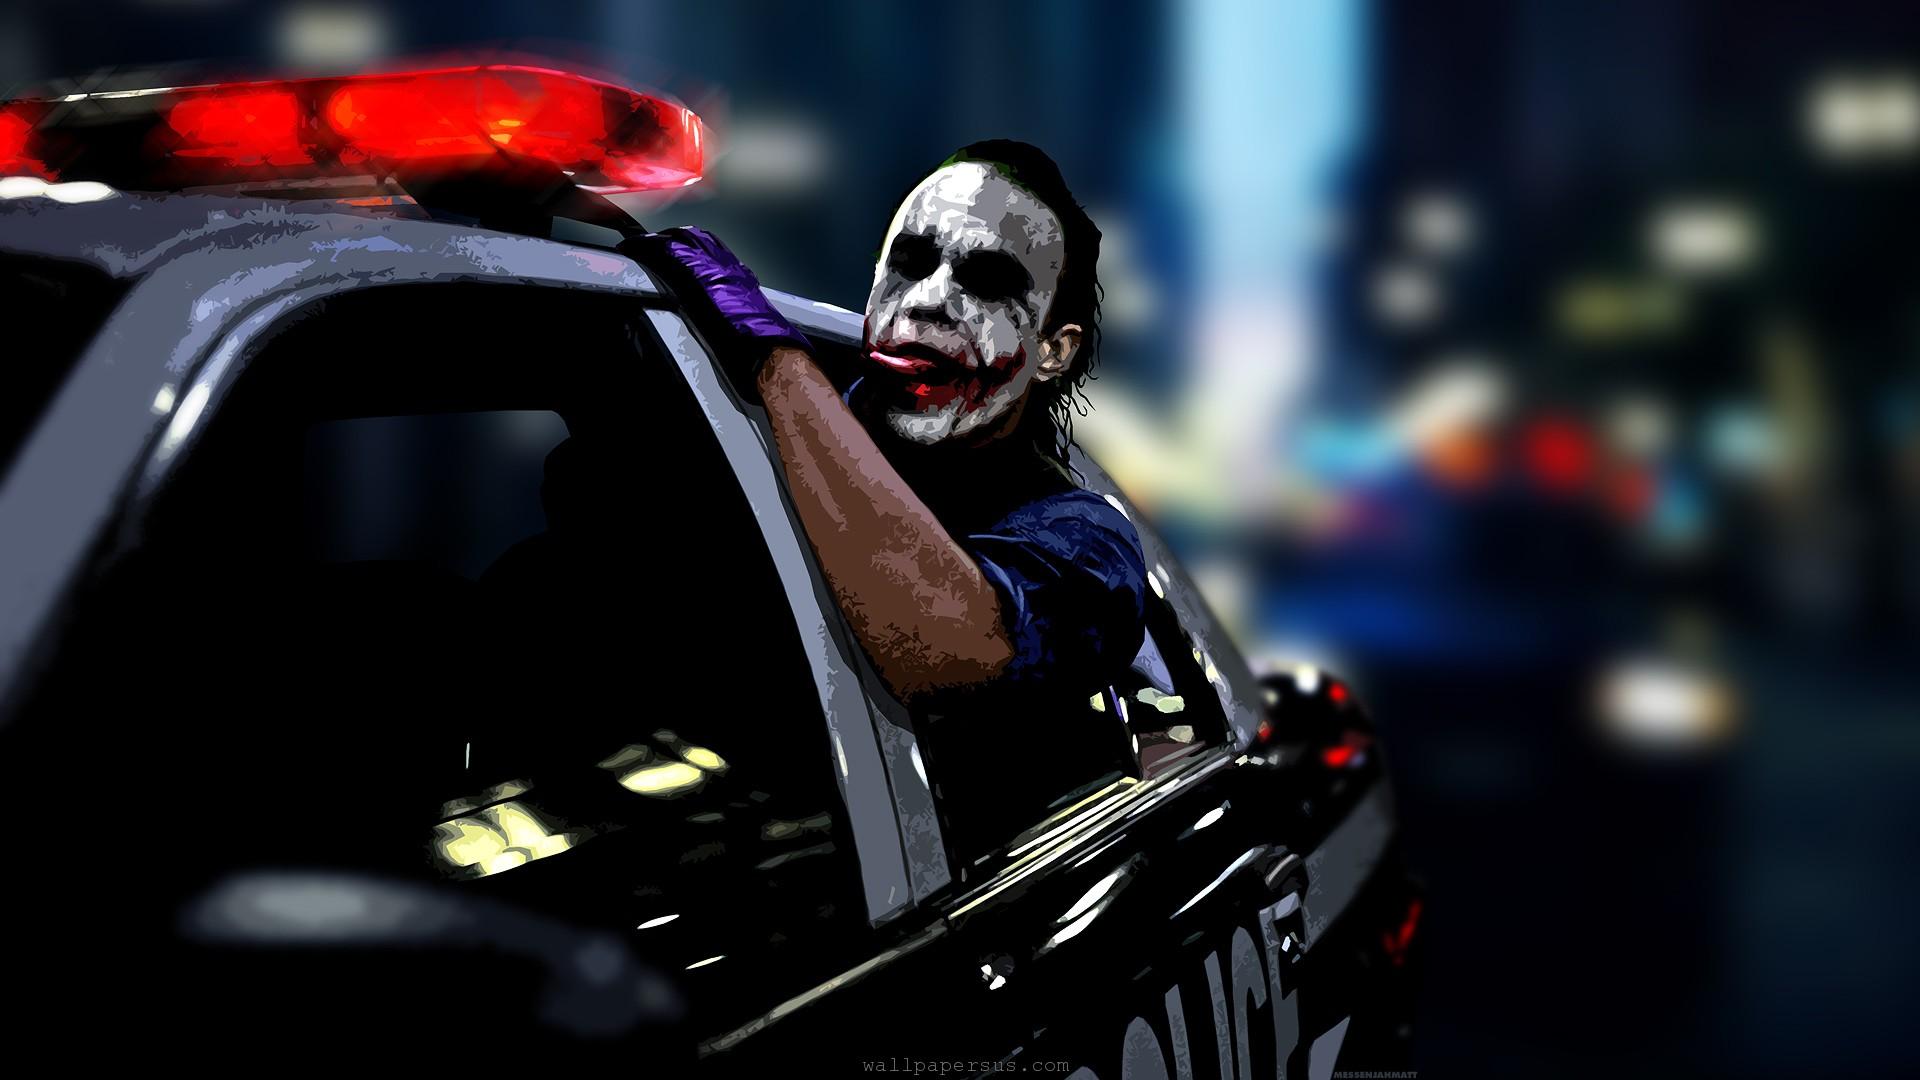 dark-knight-joker-police-smile-art-1920x1080-wallpaper-wpc90010310